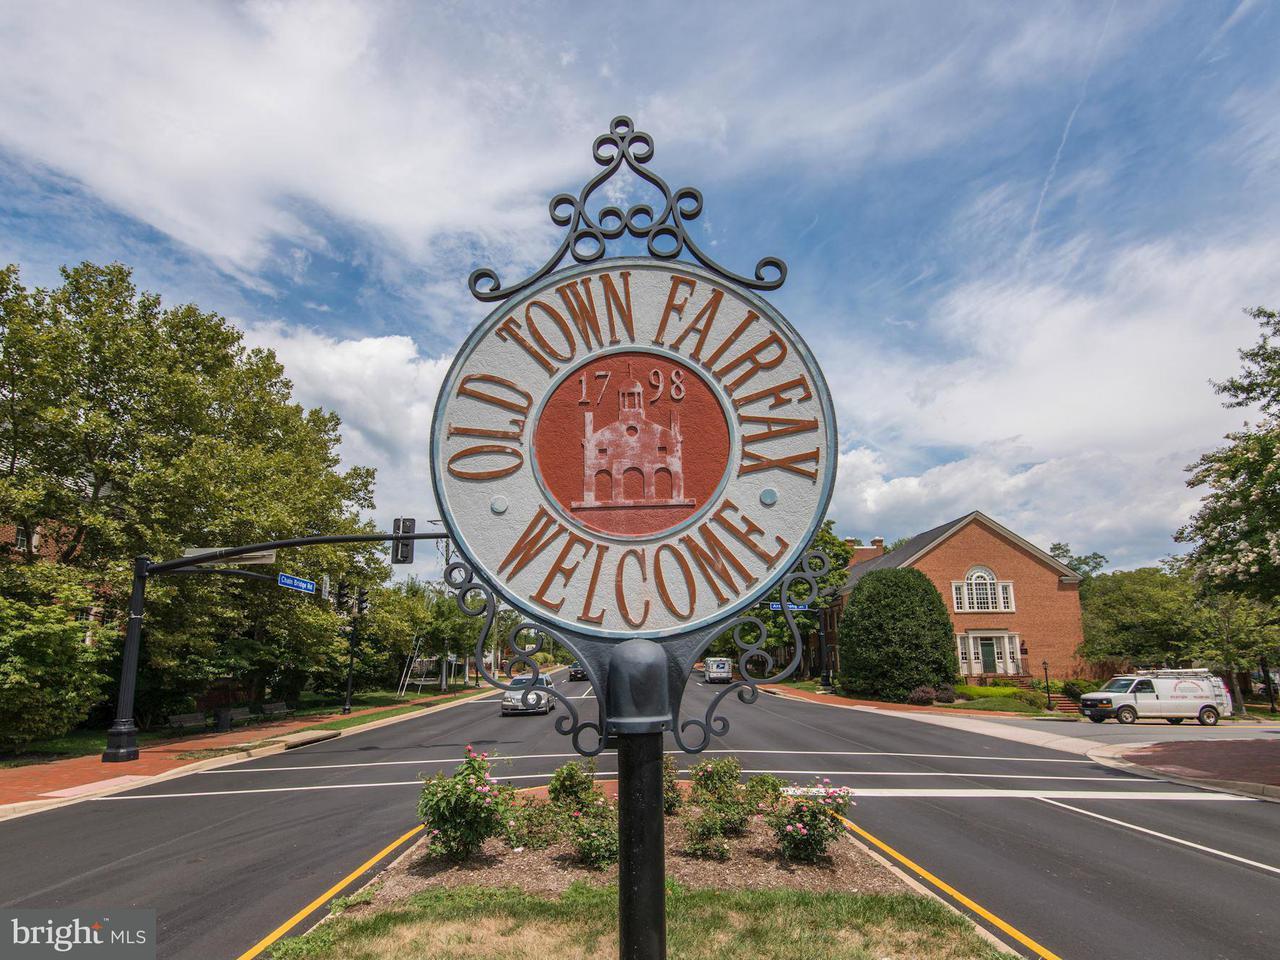 Additional photo for property listing at 3985 Norton Pl #201 3985 Norton Pl #201 Fairfax, 버지니아 22030 미국